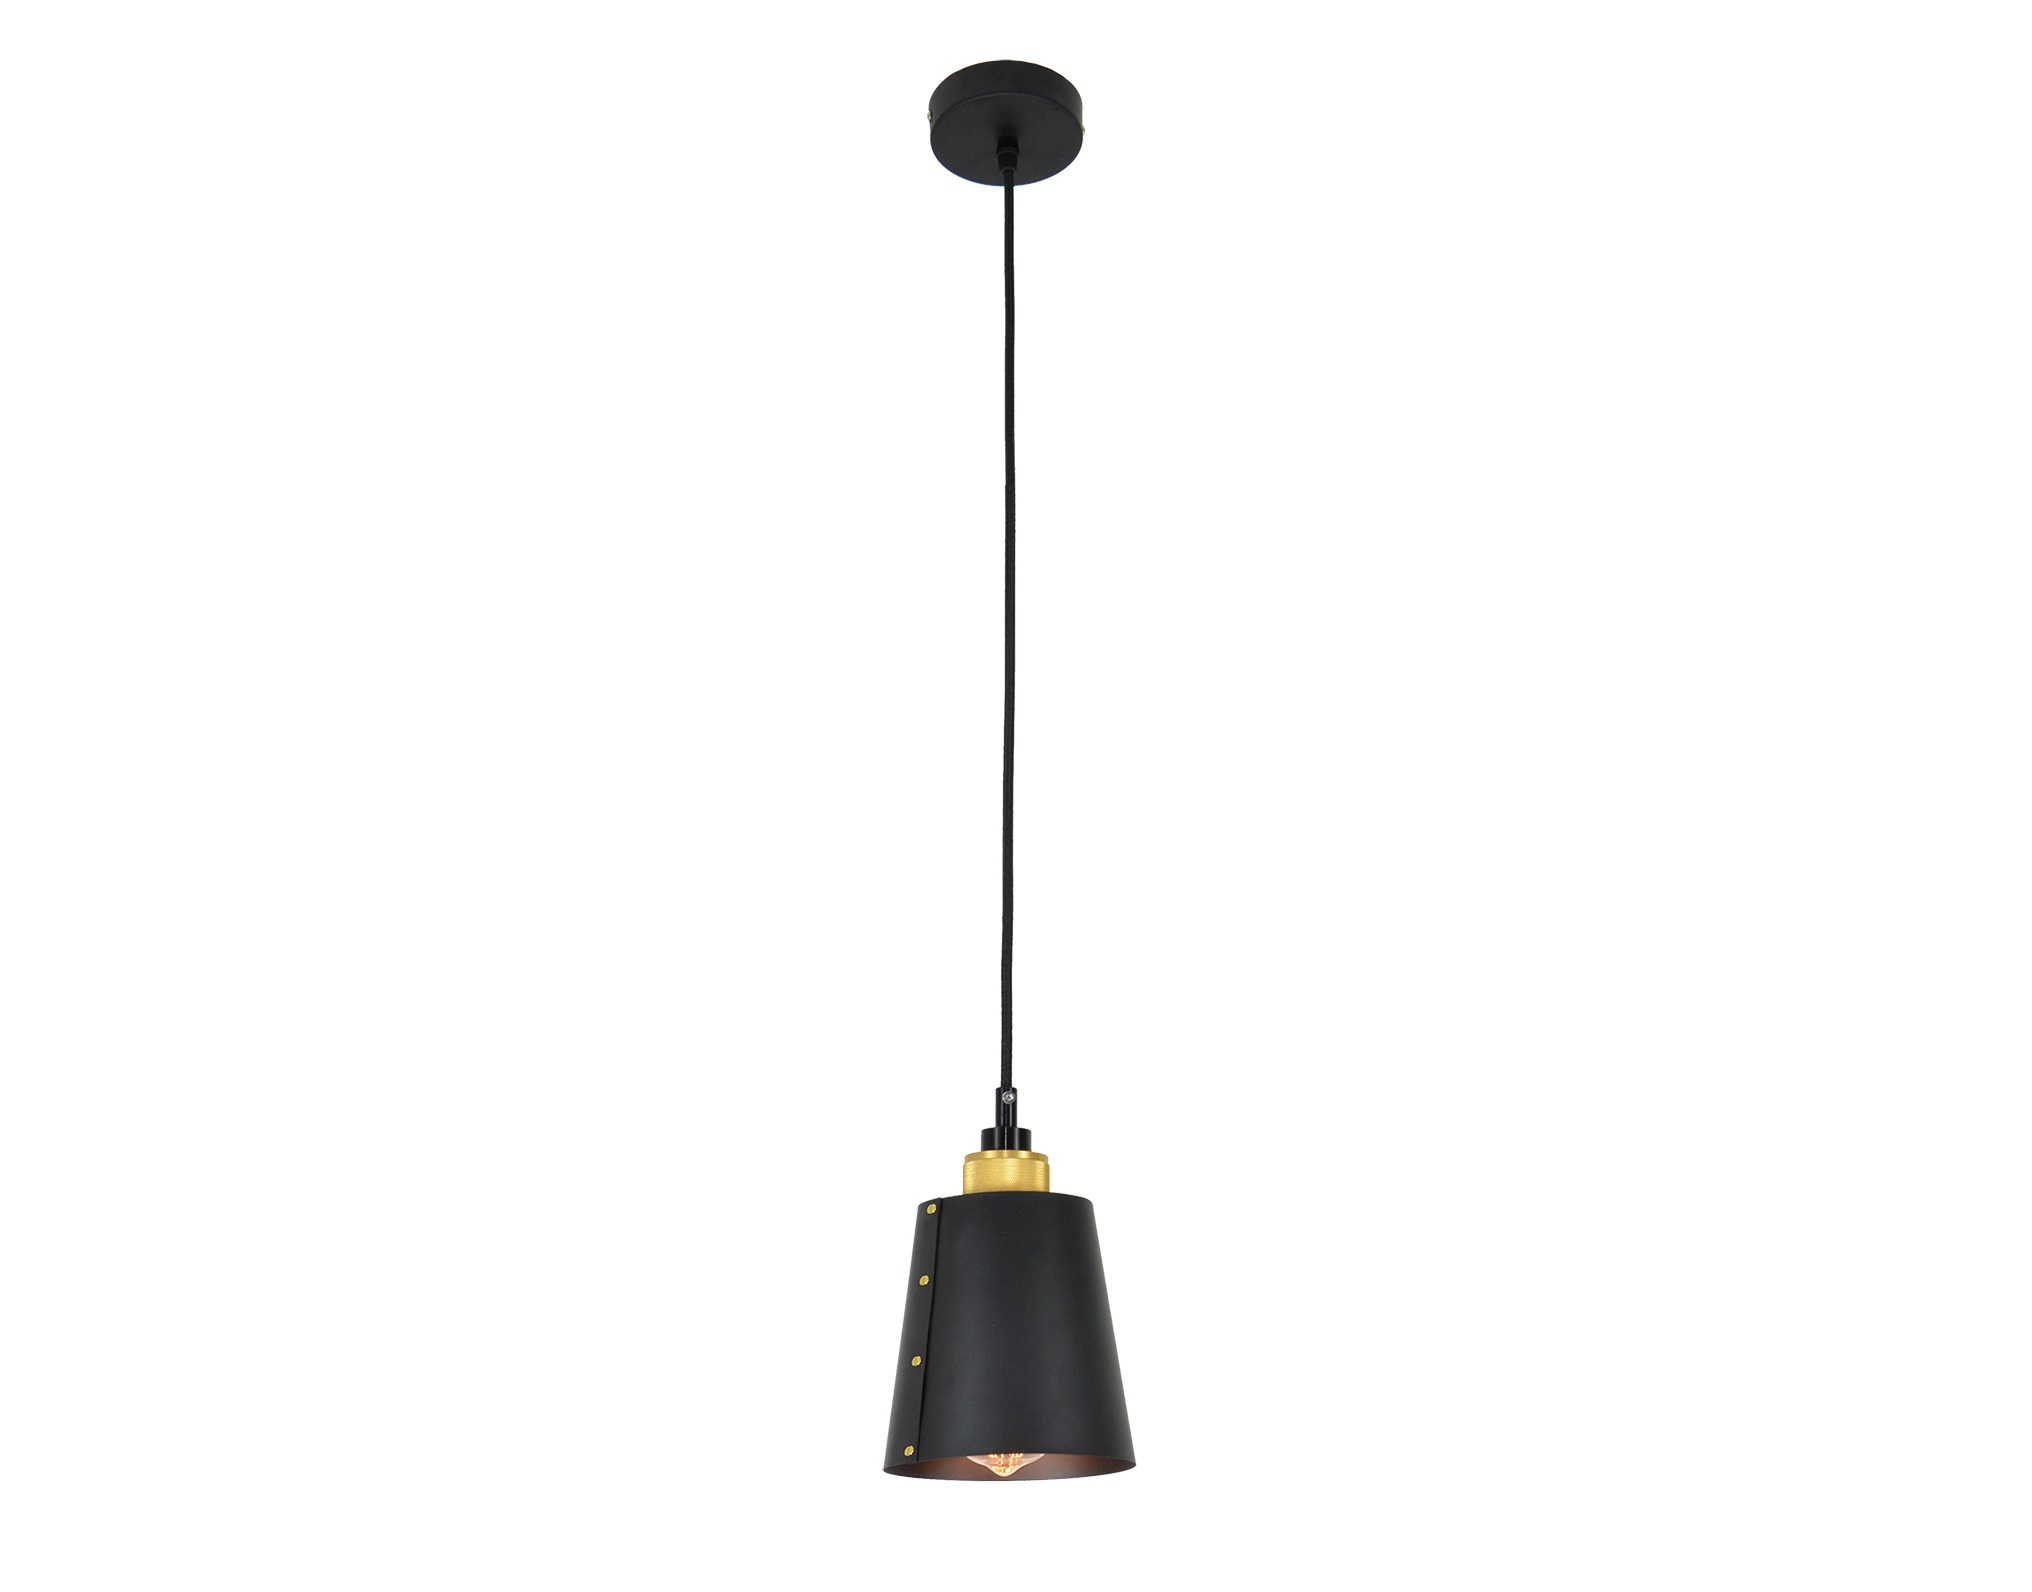 Подвесной светильникПодвесные светильники<br>&amp;lt;div&amp;gt;&amp;lt;div&amp;gt;Вид цоколя: E27&amp;lt;/div&amp;gt;&amp;lt;div&amp;gt;Мощность: 60W&amp;lt;/div&amp;gt;&amp;lt;div&amp;gt;Количество ламп: 1&amp;lt;/div&amp;gt;&amp;lt;div&amp;gt;Наличие ламп: отсутствуют.&amp;lt;/div&amp;gt;&amp;lt;/div&amp;gt;<br><br>Material: Металл<br>Width см: None<br>Height см: 140<br>Diameter см: 14